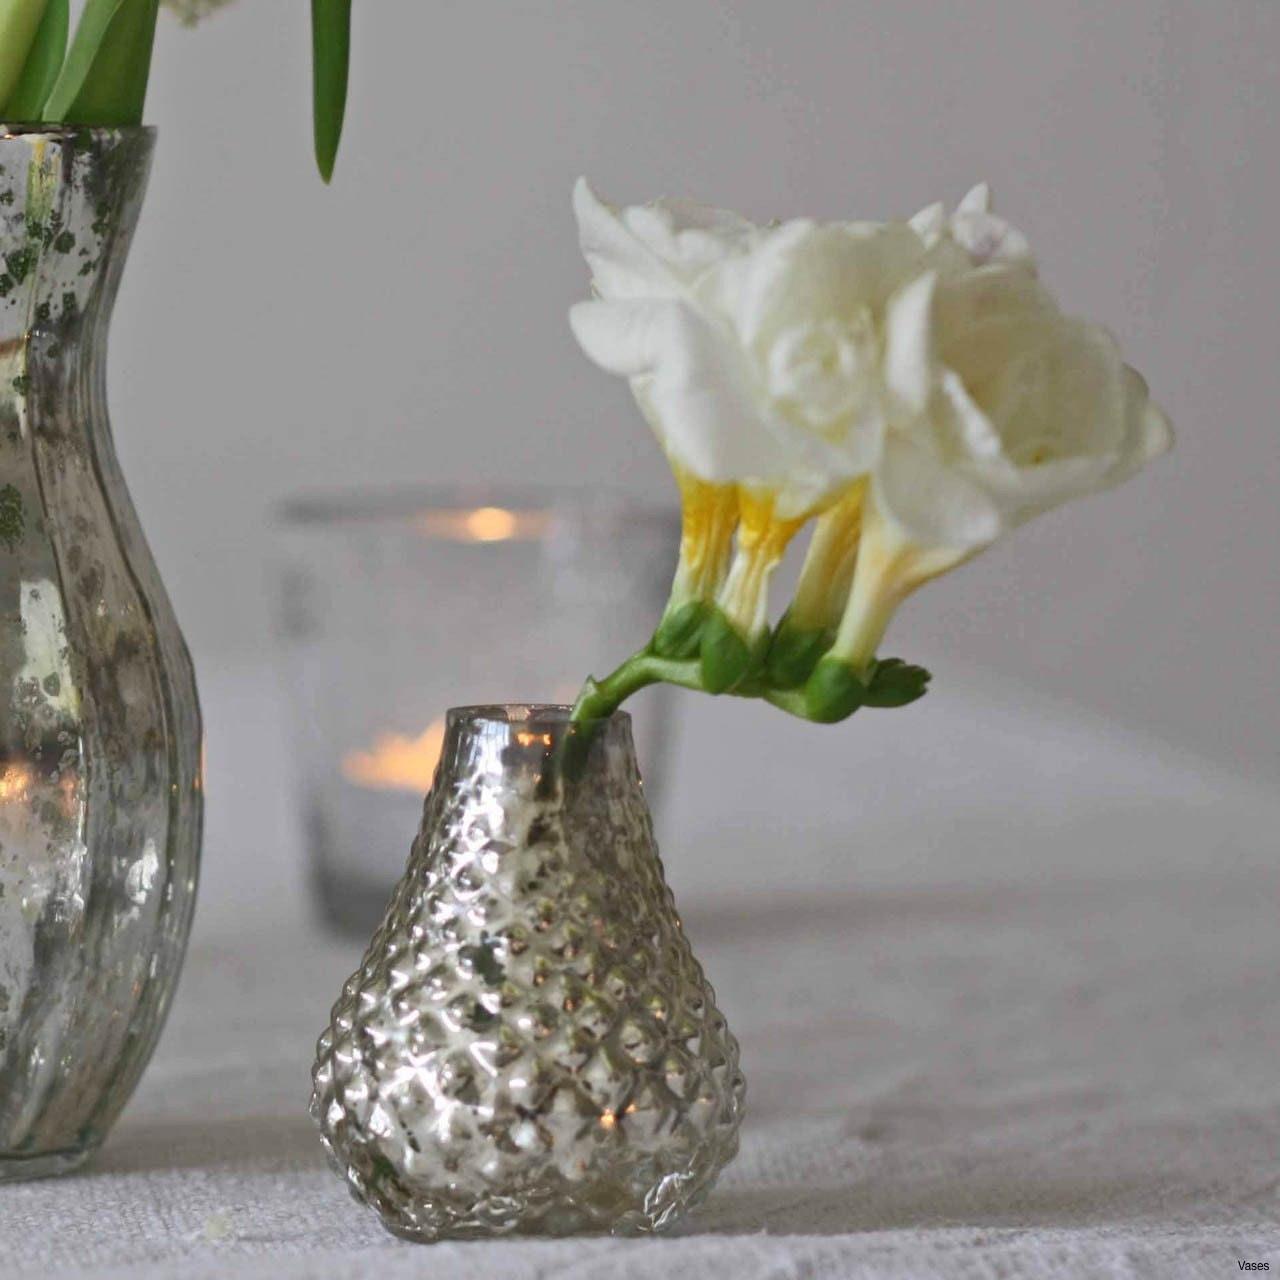 blue and brown decorative vases of diy yard decor beautiful jar flower 1h vases bud wedding vase within diy yard decor beautiful jar flower 1h vases bud wedding vase centerpiece idea i 0d design